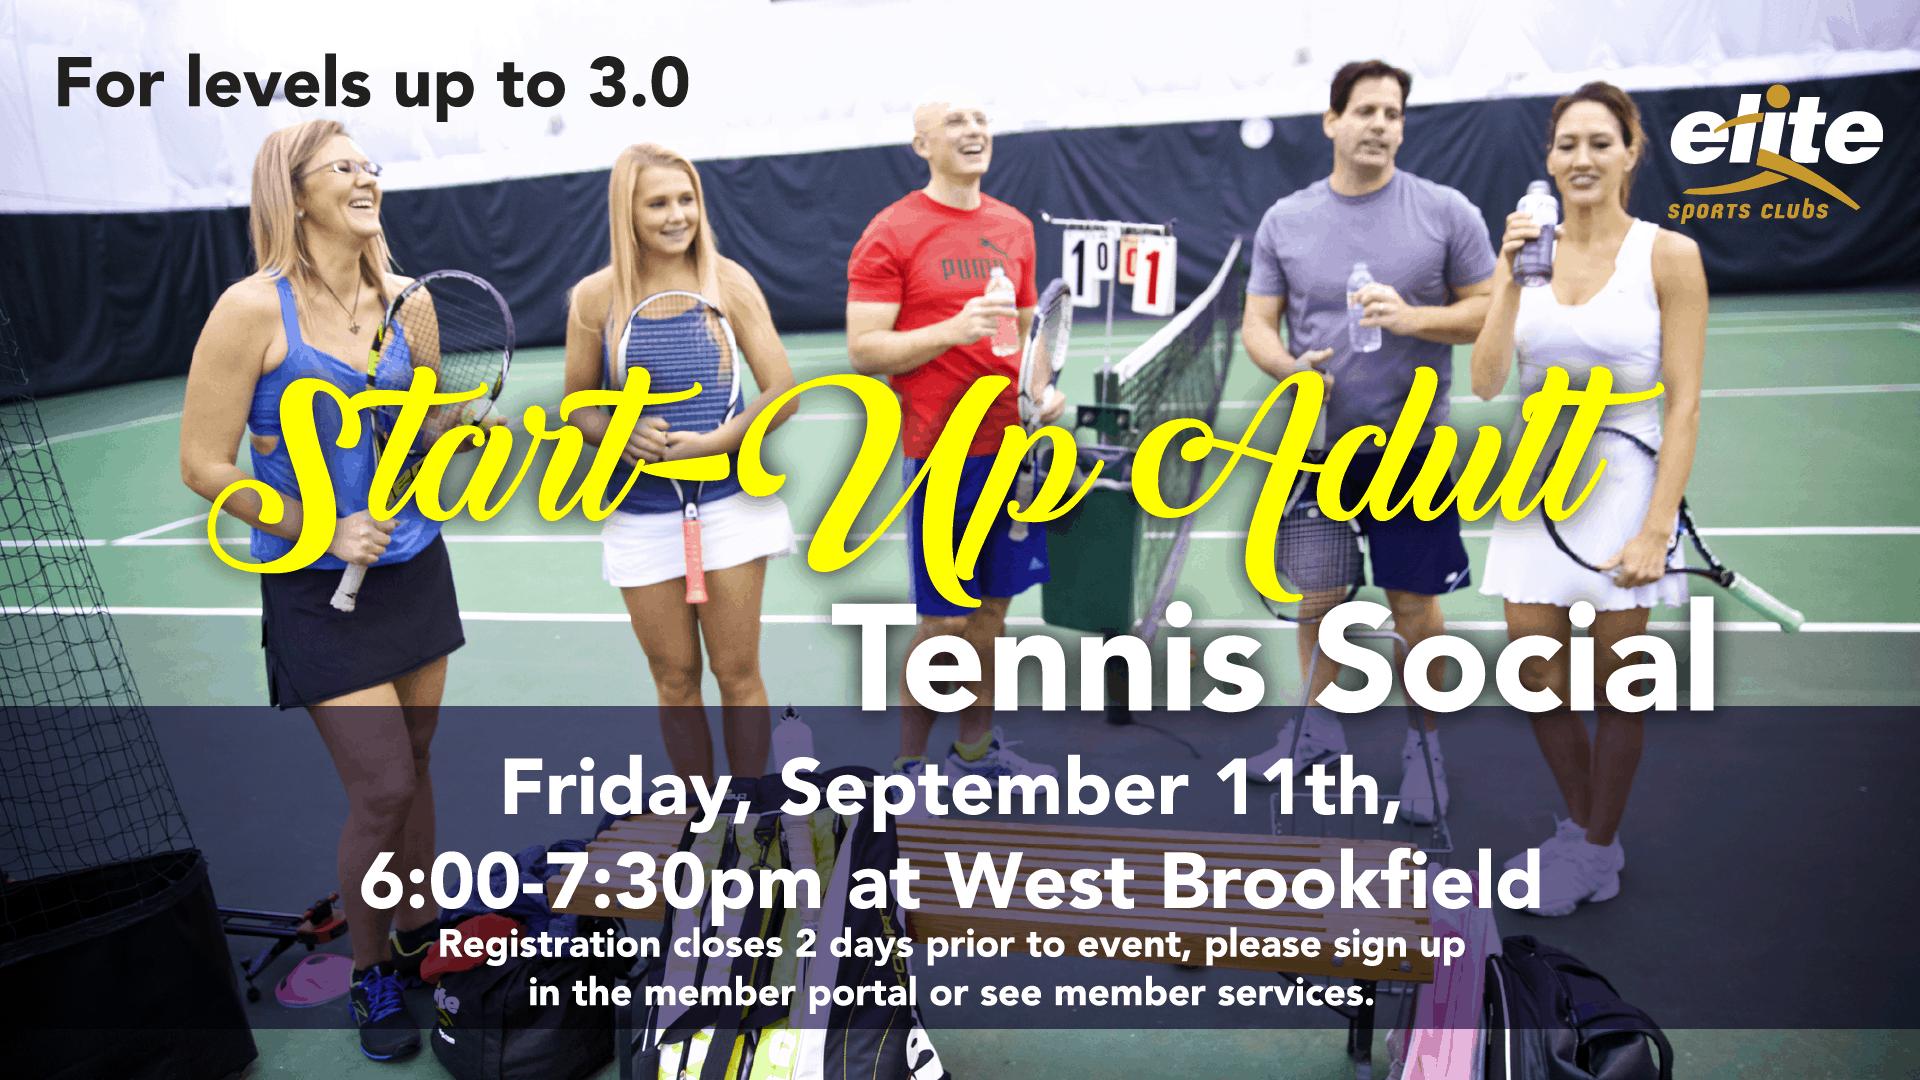 Start-up Adult Tennis Social - Elite West Brookfield - September 2020